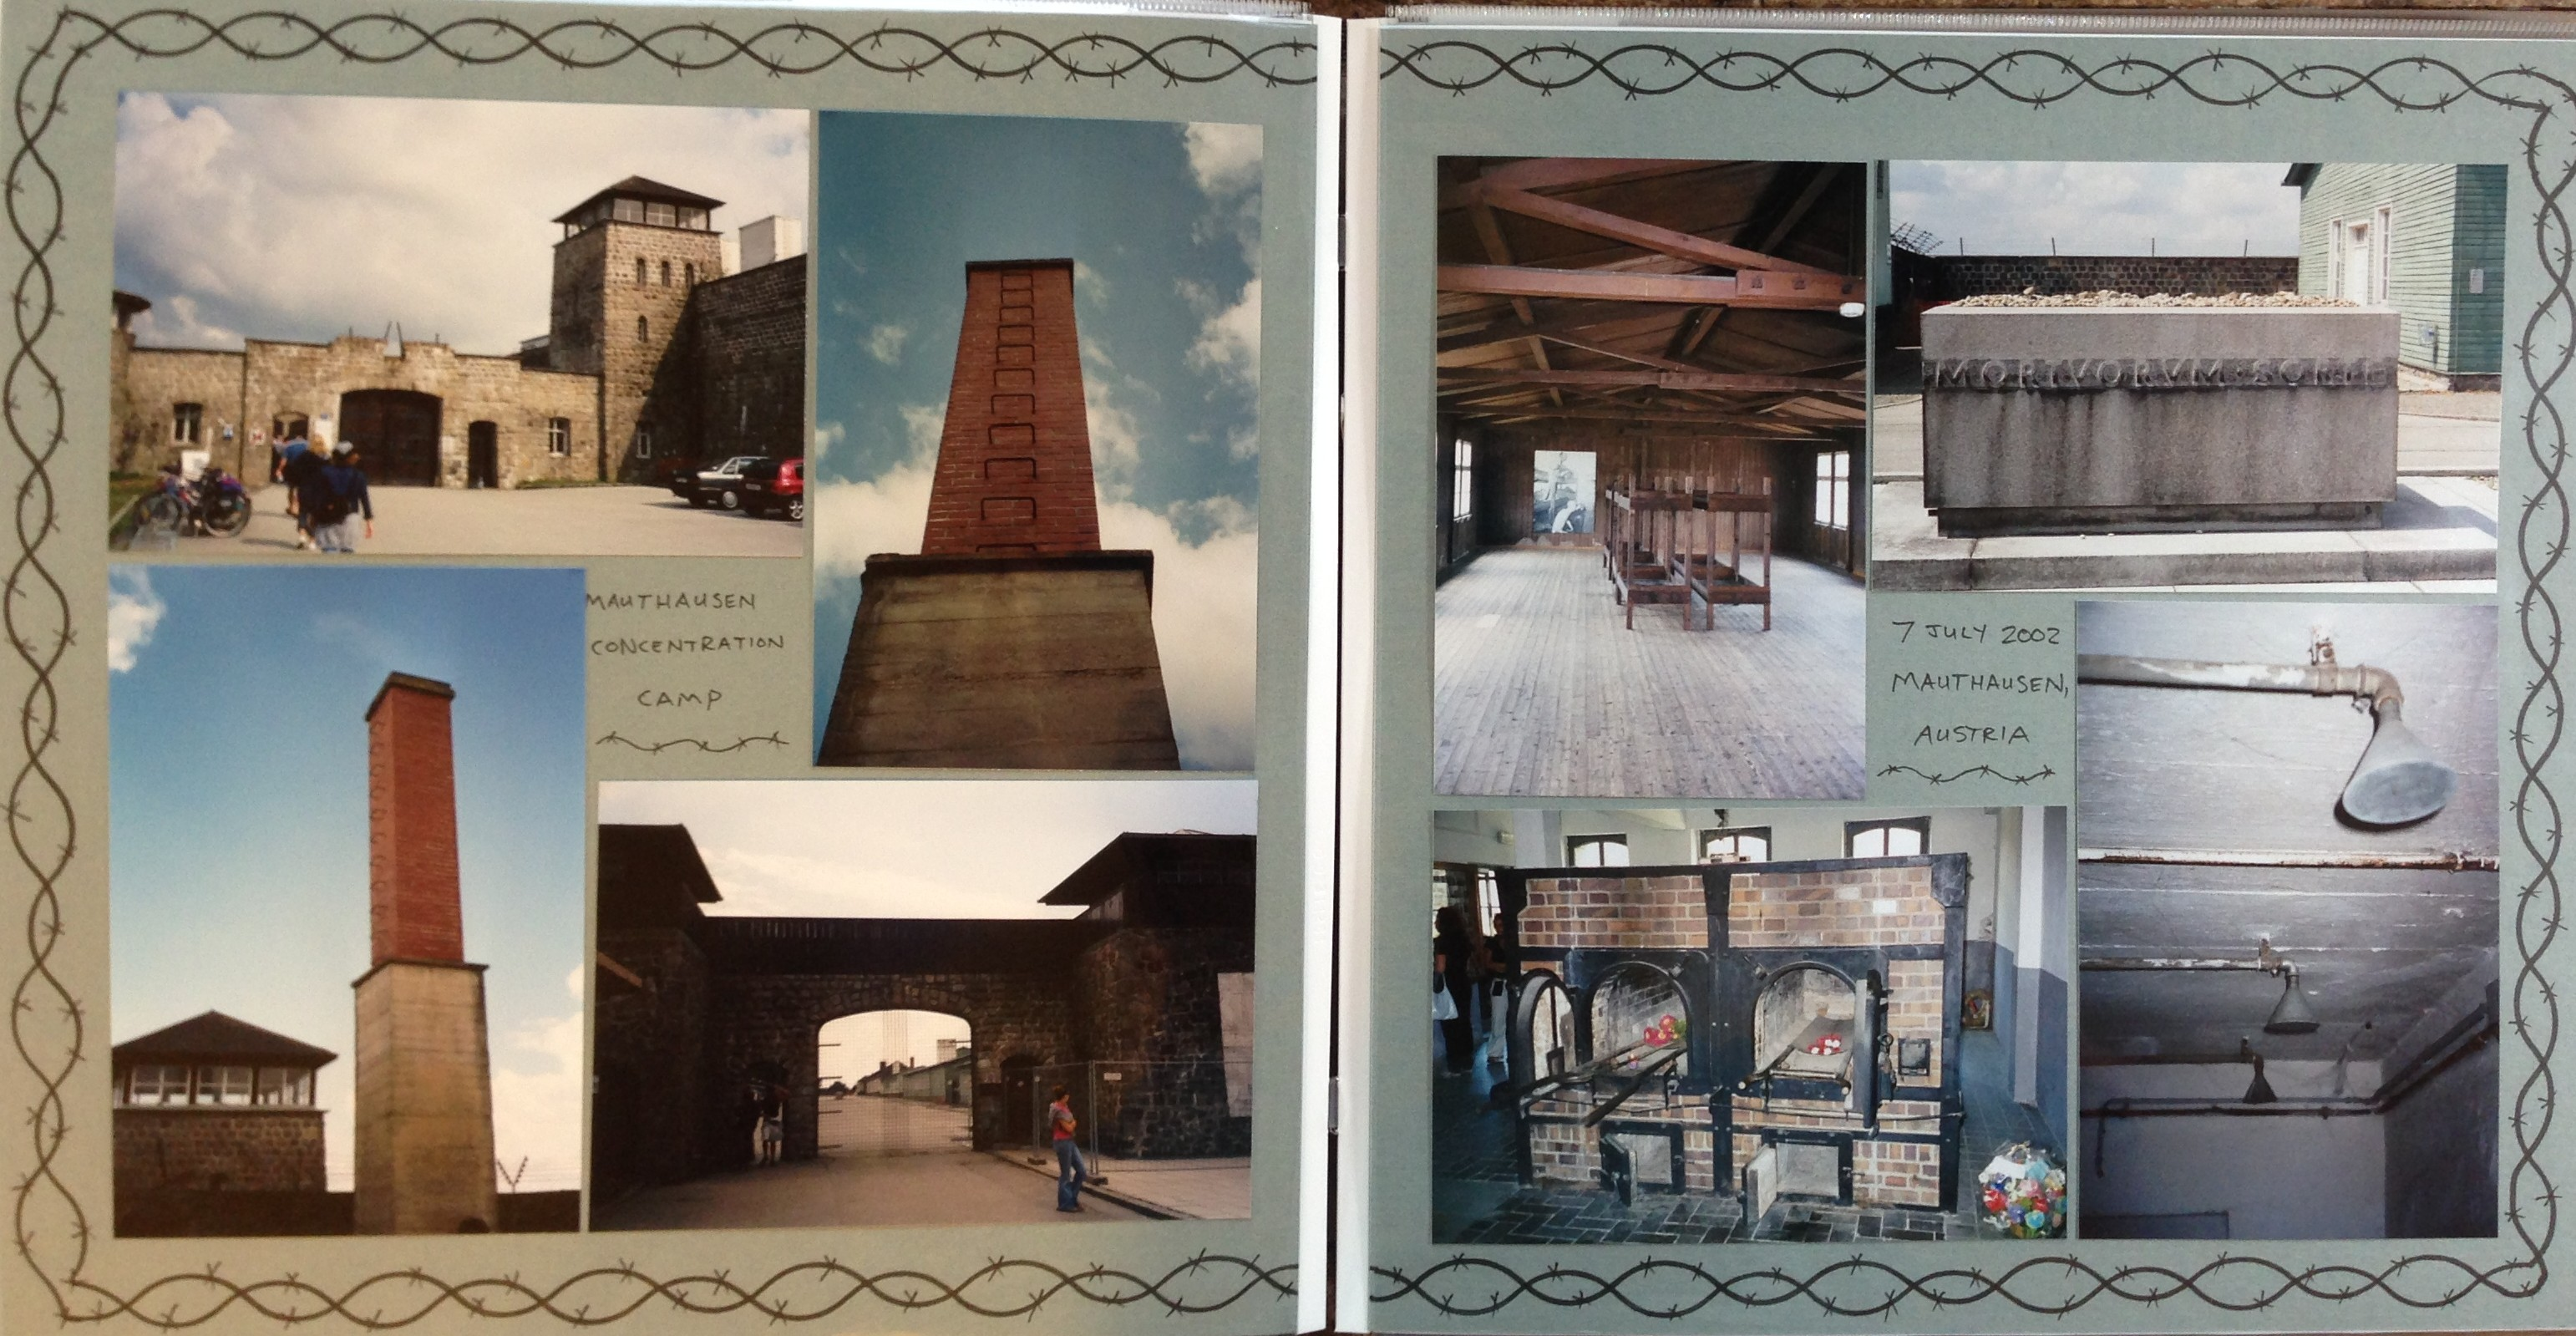 Europe scrapbook ideas - Europe Vacation Mauthausen Concentration Camp Austria